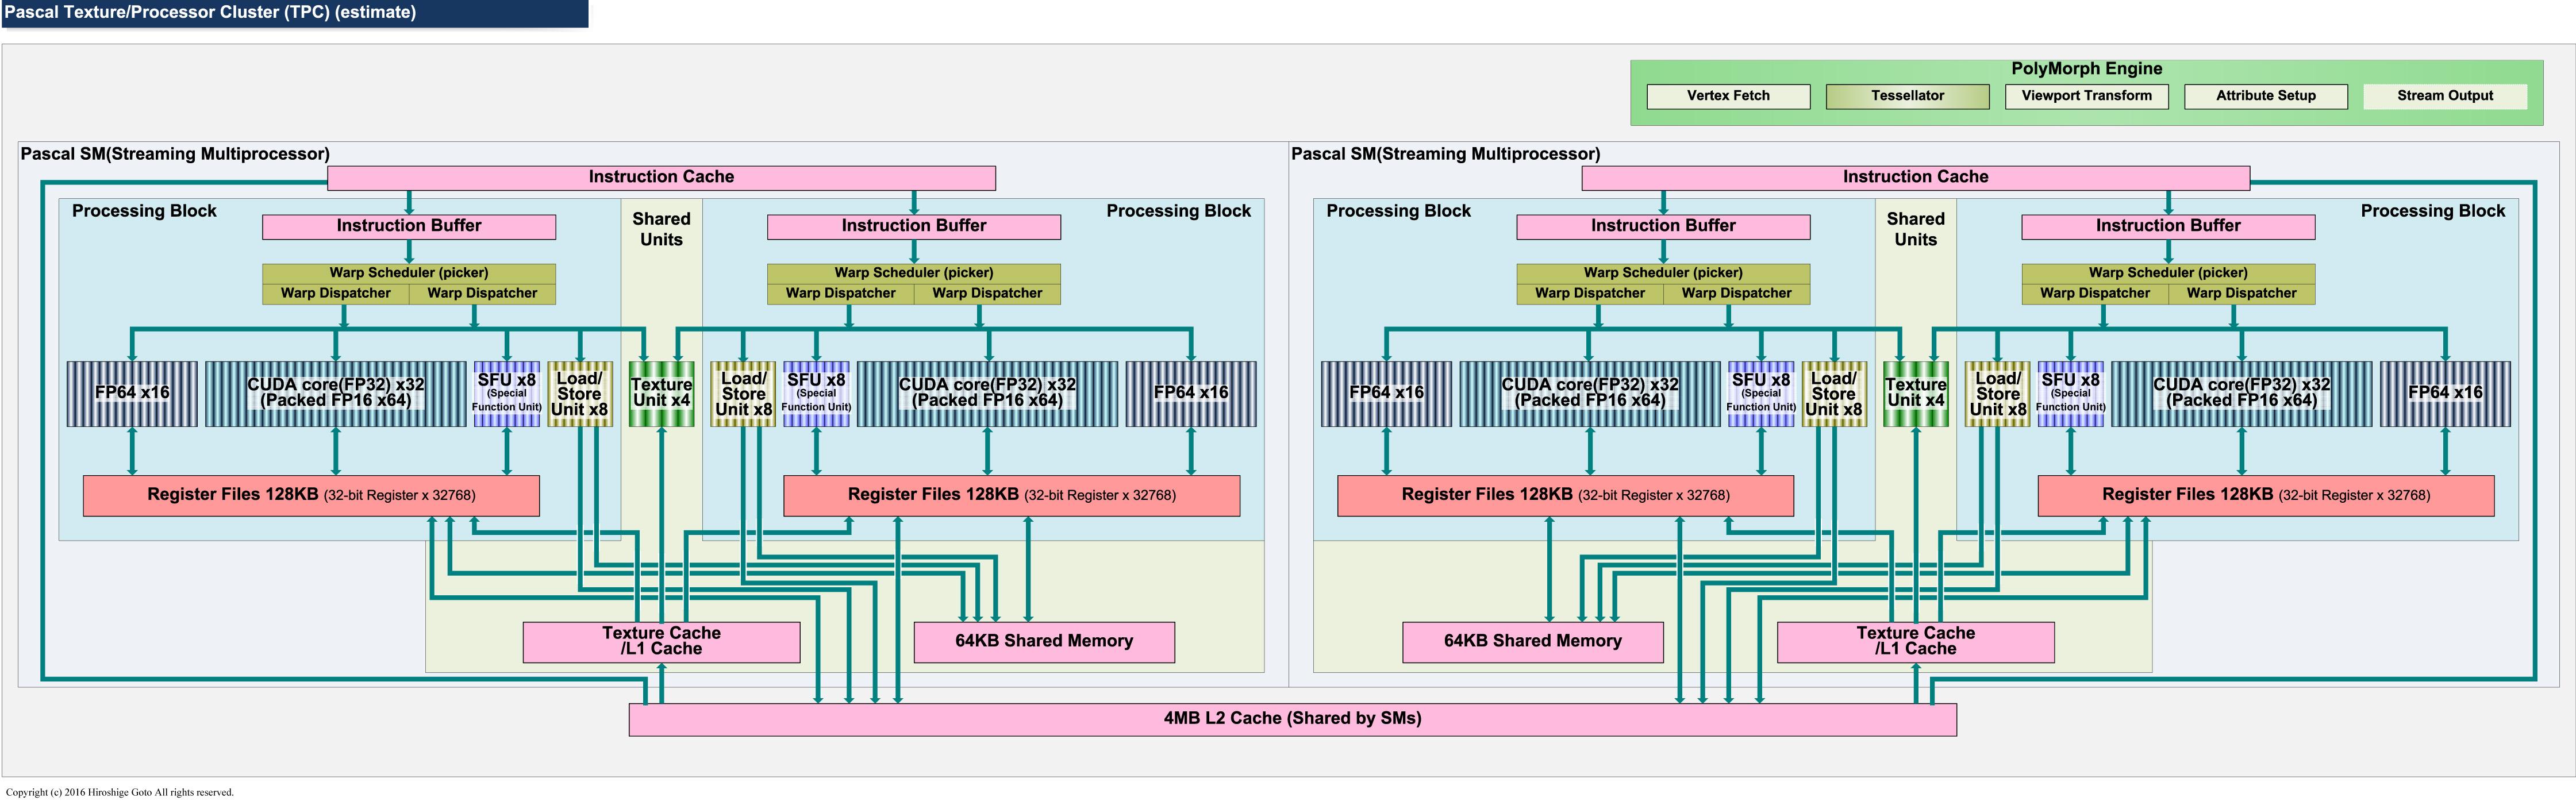 "GP100のTPC<br class="""">PDF版は<span class=""img-inline raw""><a href=""/video/pcw/docs/757/916/p10.pdf"" ipw_status=""1"" ipw_linktype=""filelink_raw"" class=""resource"">こちら</a></span>"